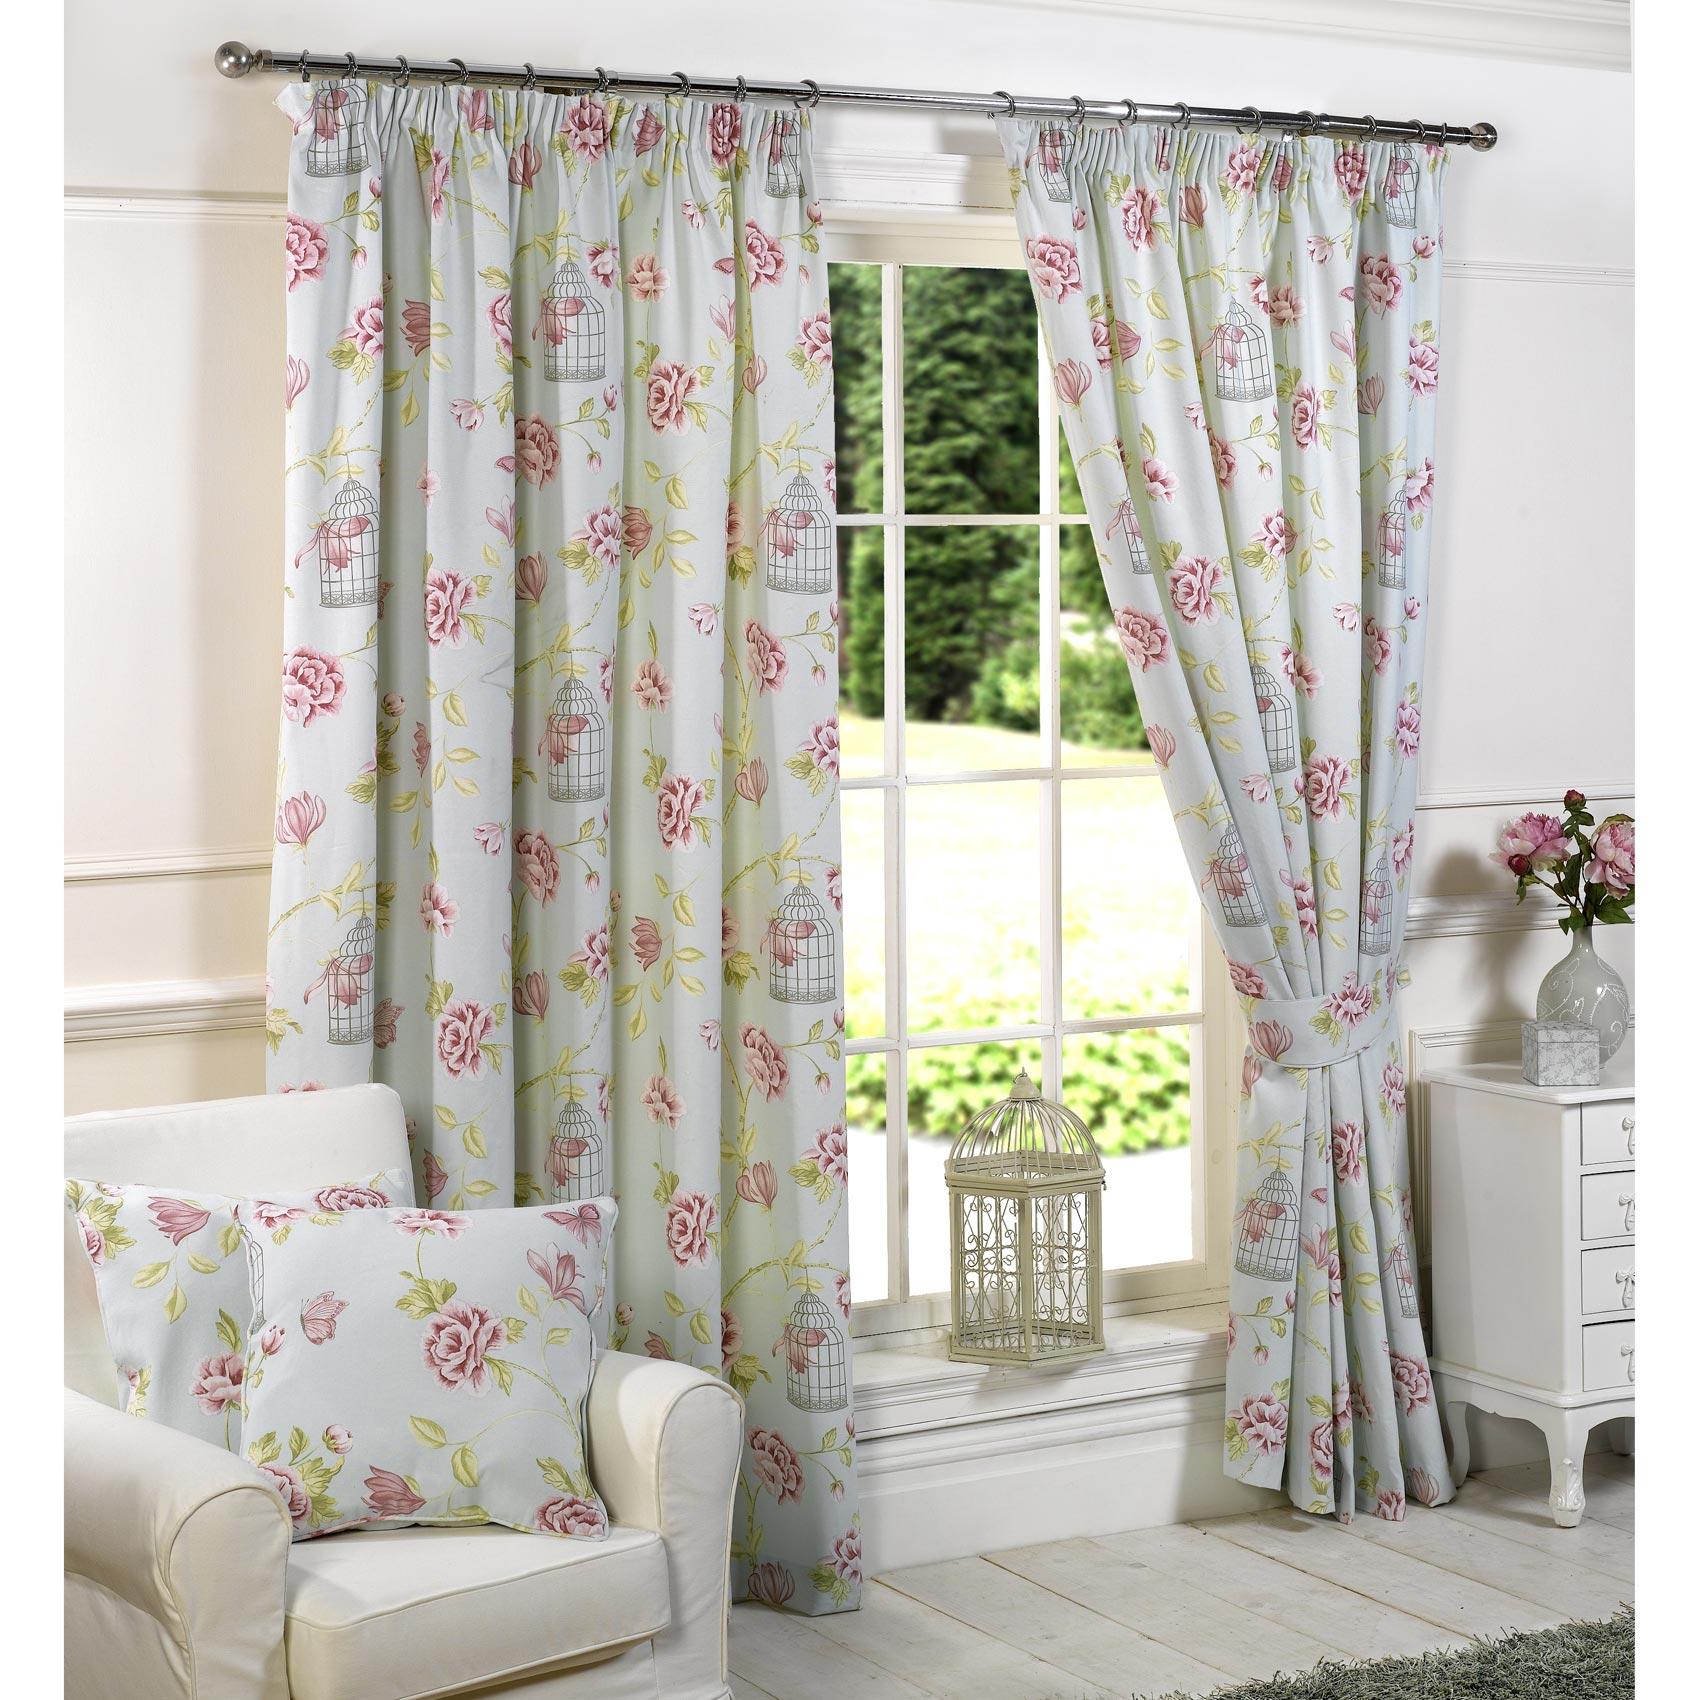 Online Brochures & Barbaras Curtains Gloucester